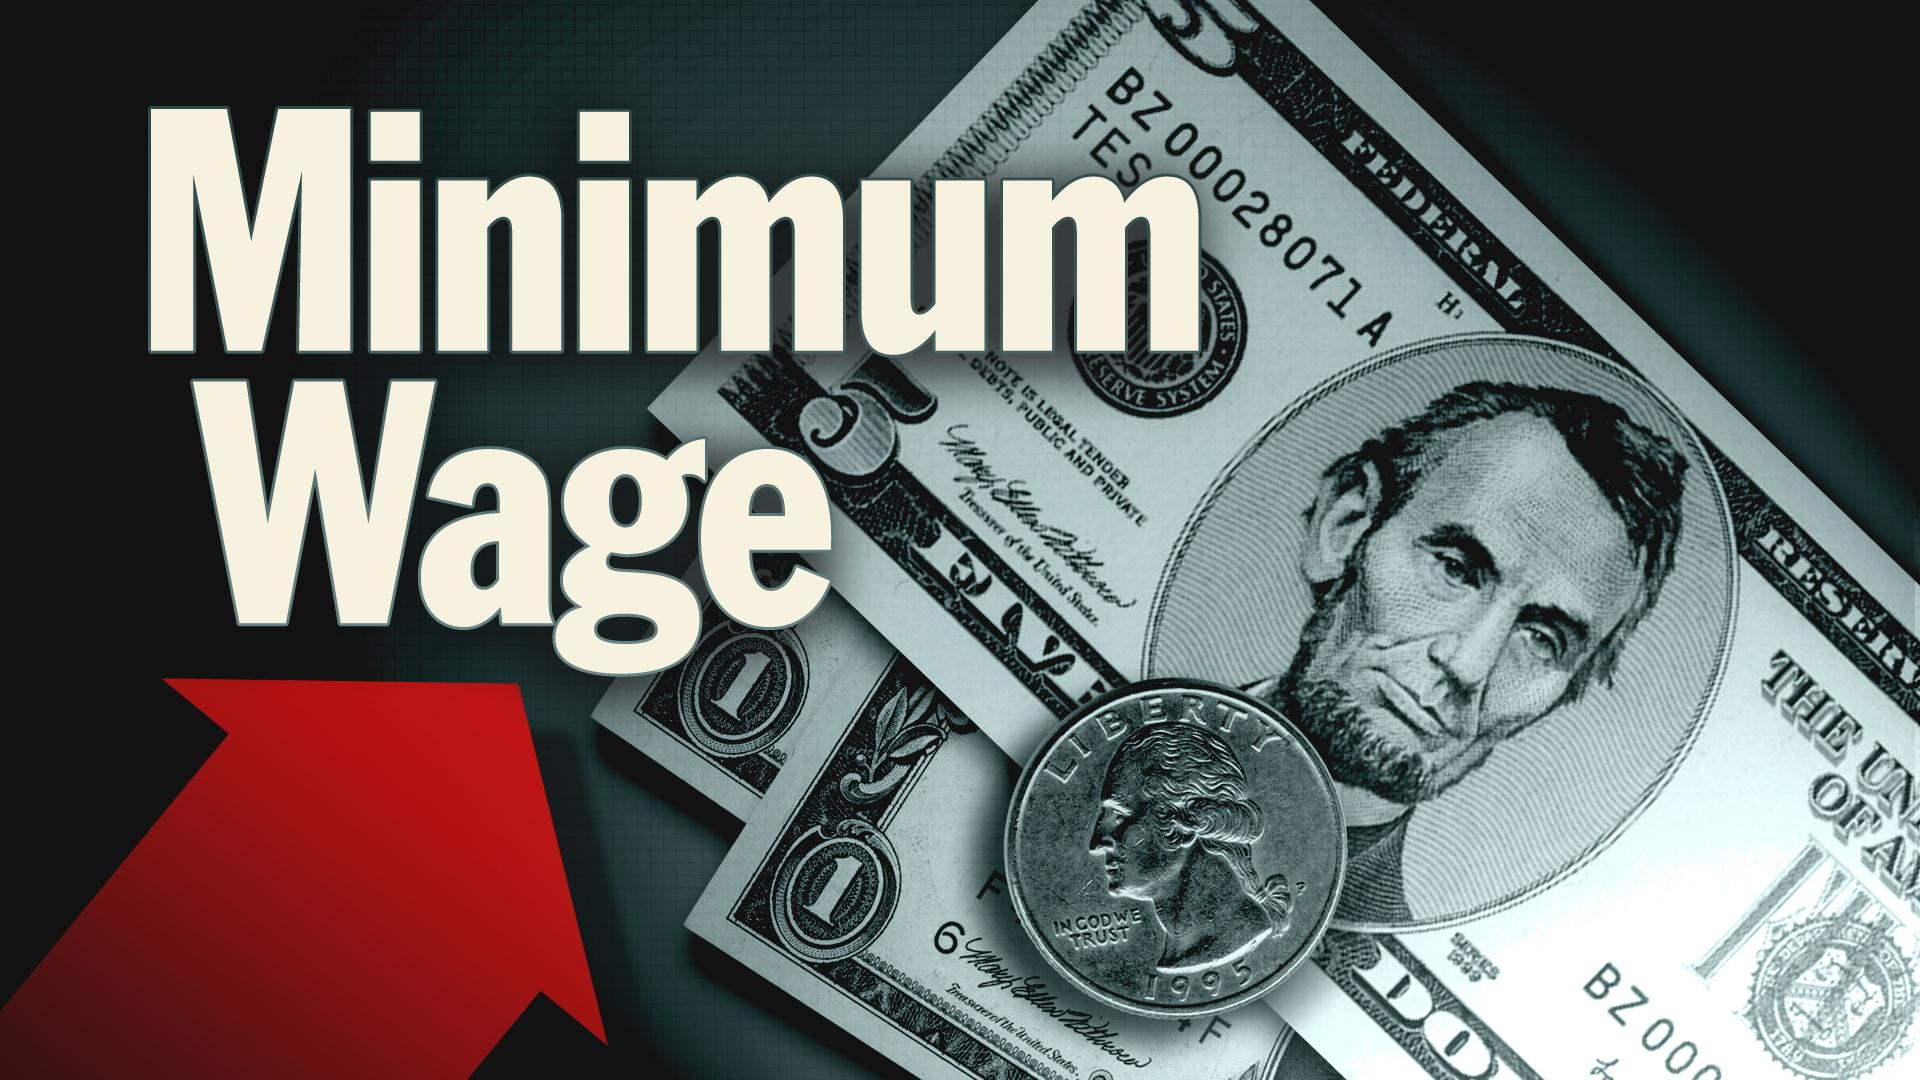 Minimum Wage Mythbusters